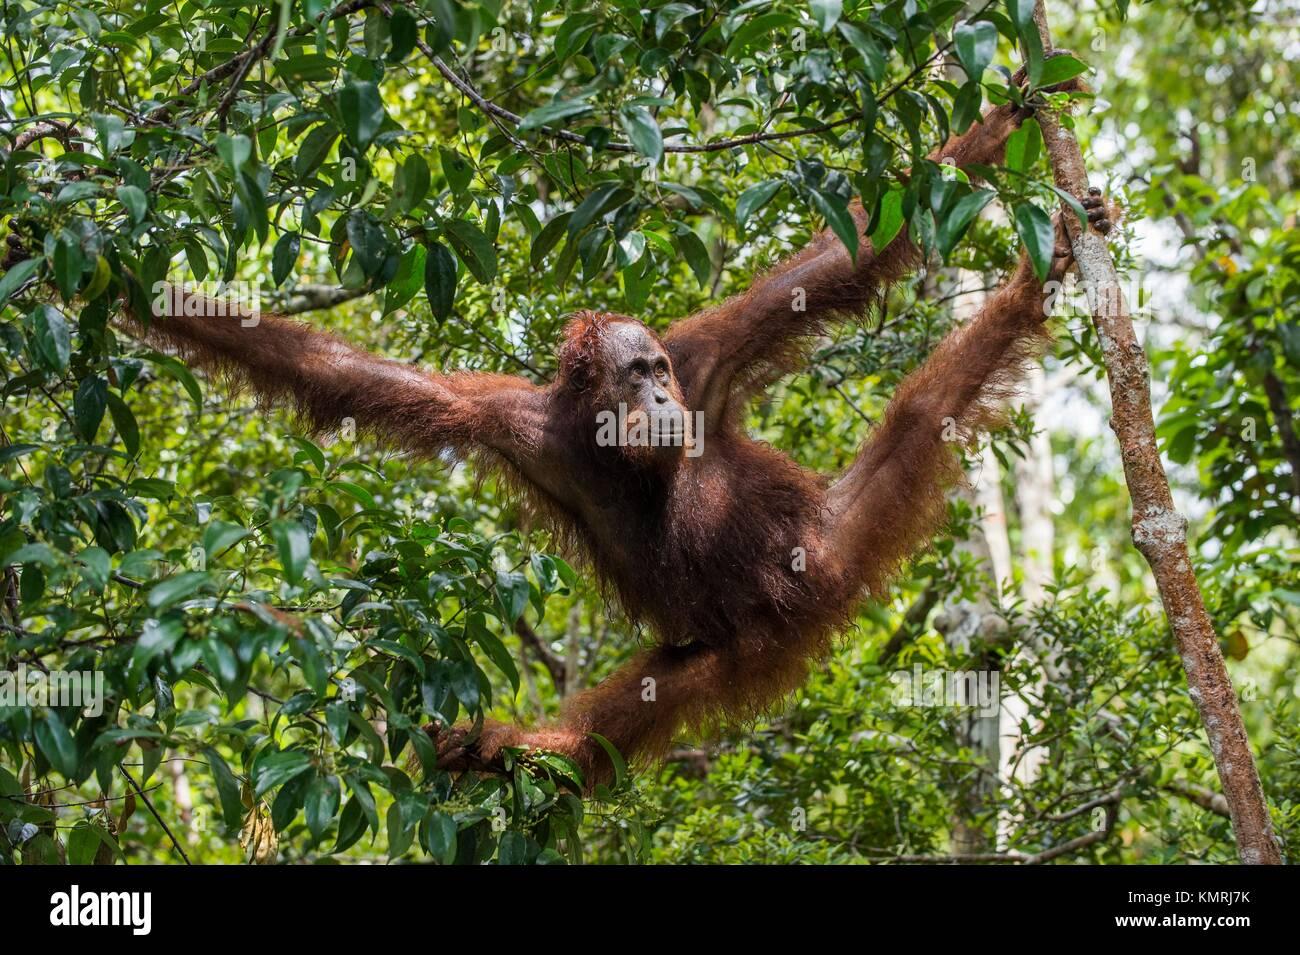 Bornean orangutan (Pongo pygmaeus) under rain on the tree in the wild nature. Central Bornean orangutan ( Pongo - Stock Image